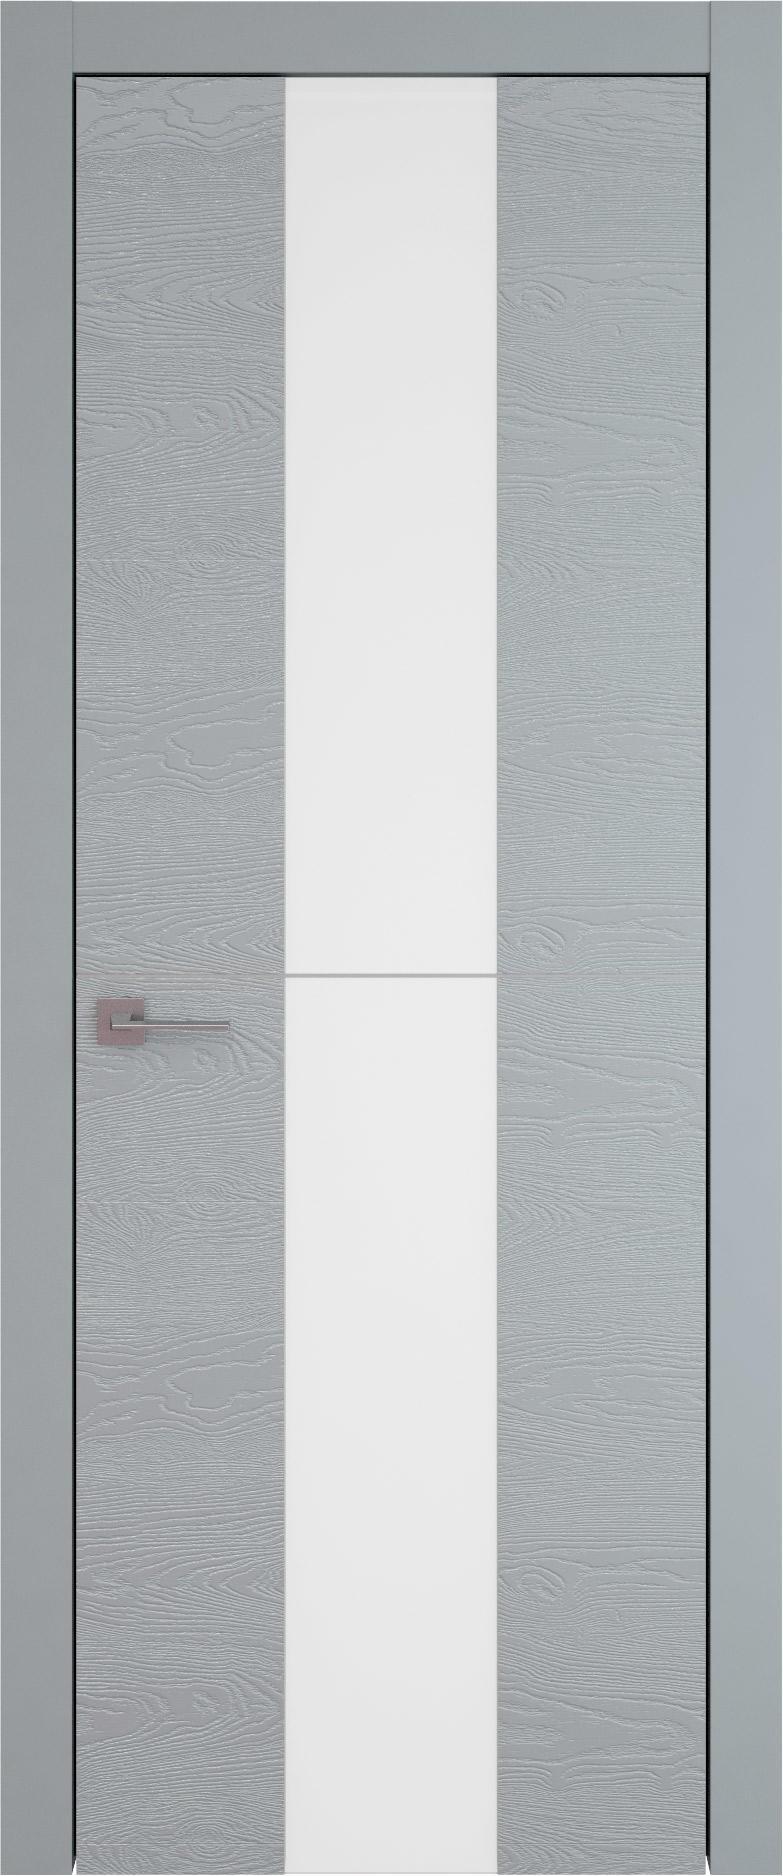 Tivoli Ж-3 цвет - Серебристо-серая эмаль по шпону (RAL 7045) Со стеклом (ДО)